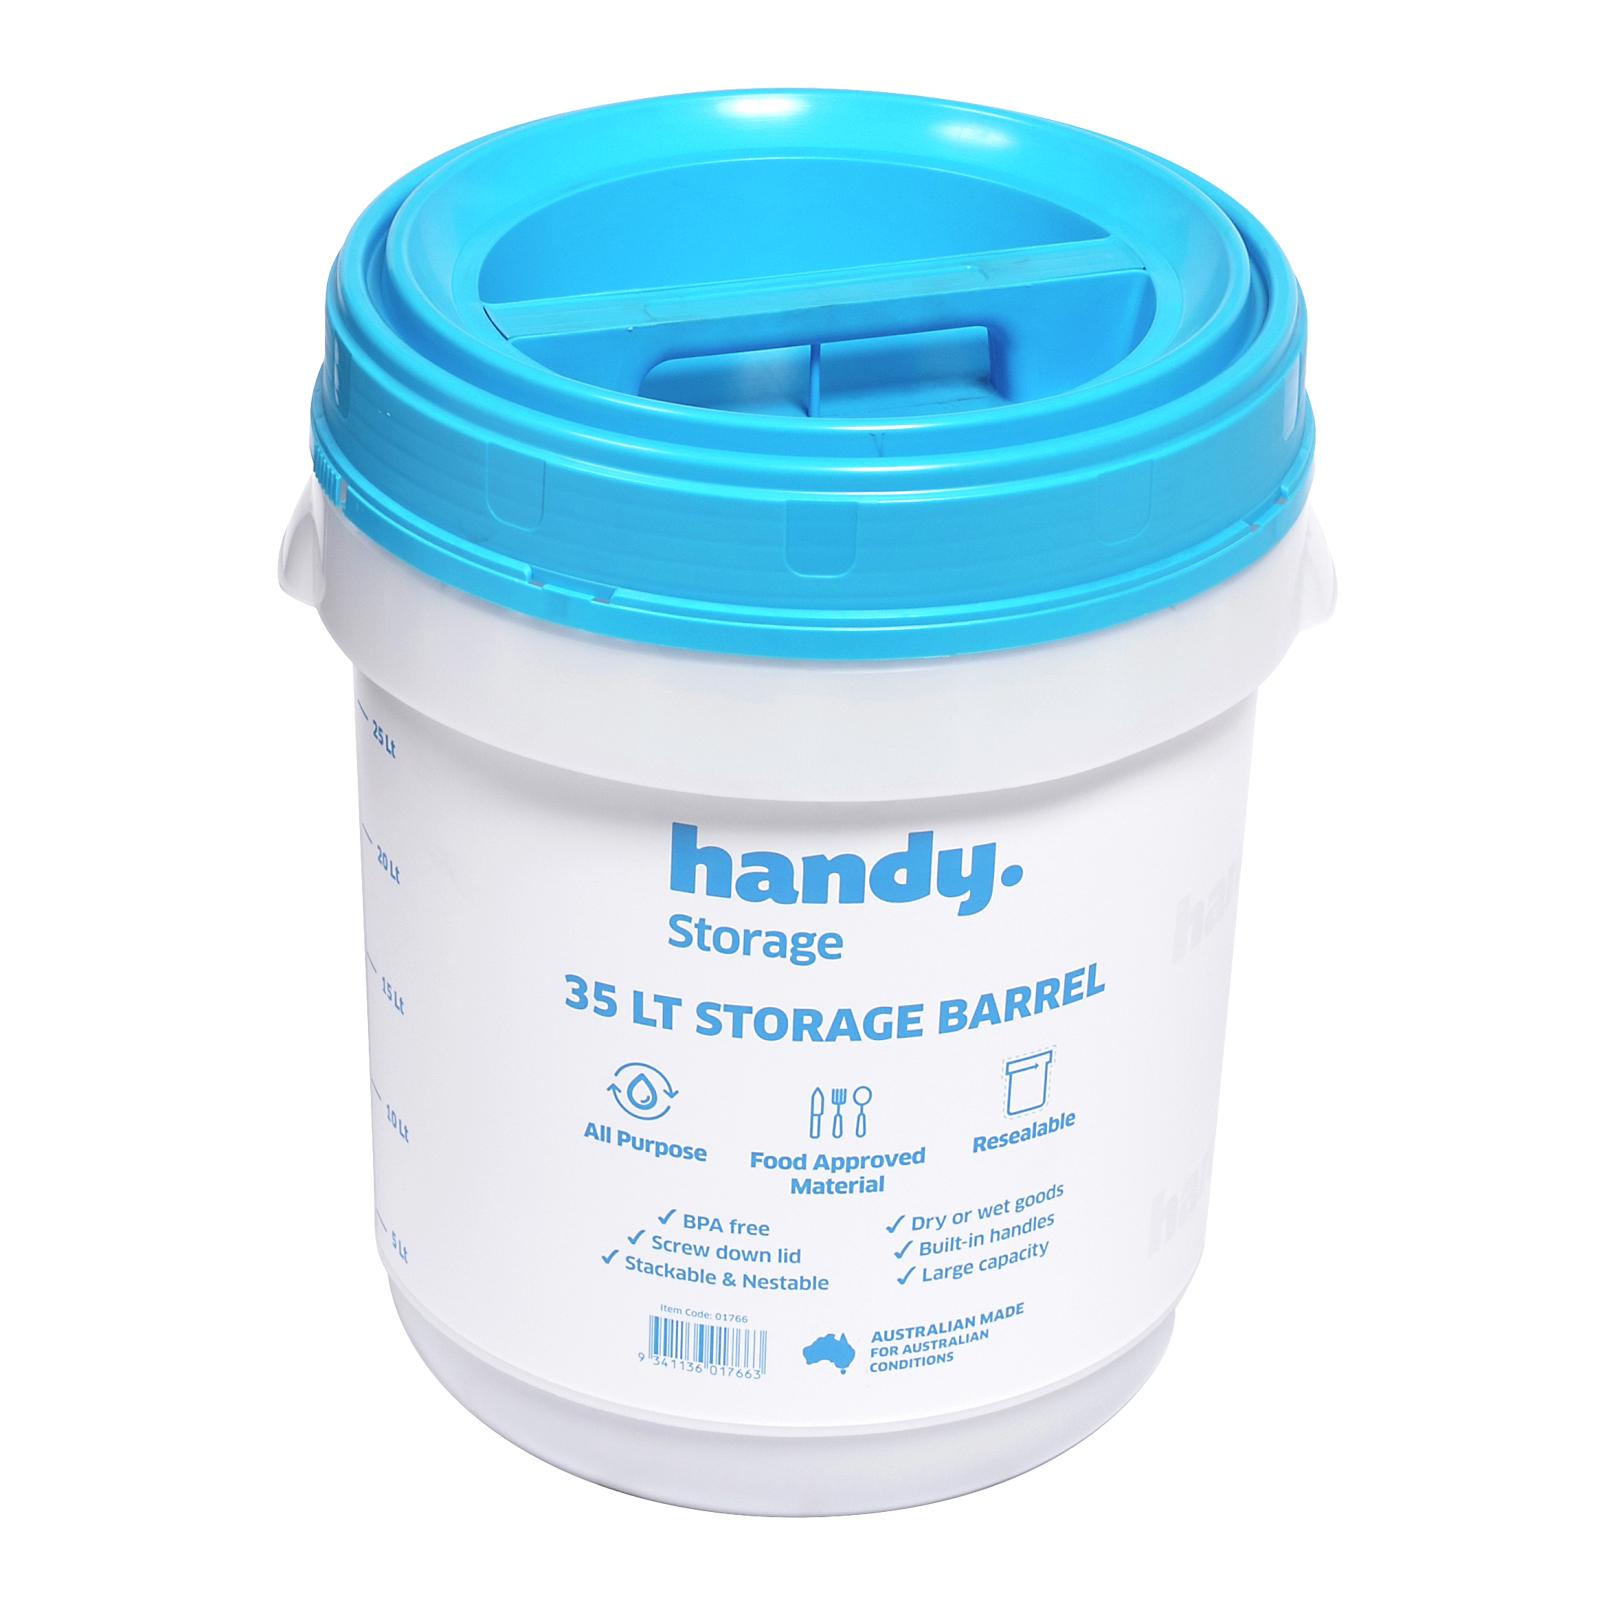 Handy Storage 35L All Purpose Storage Barrel